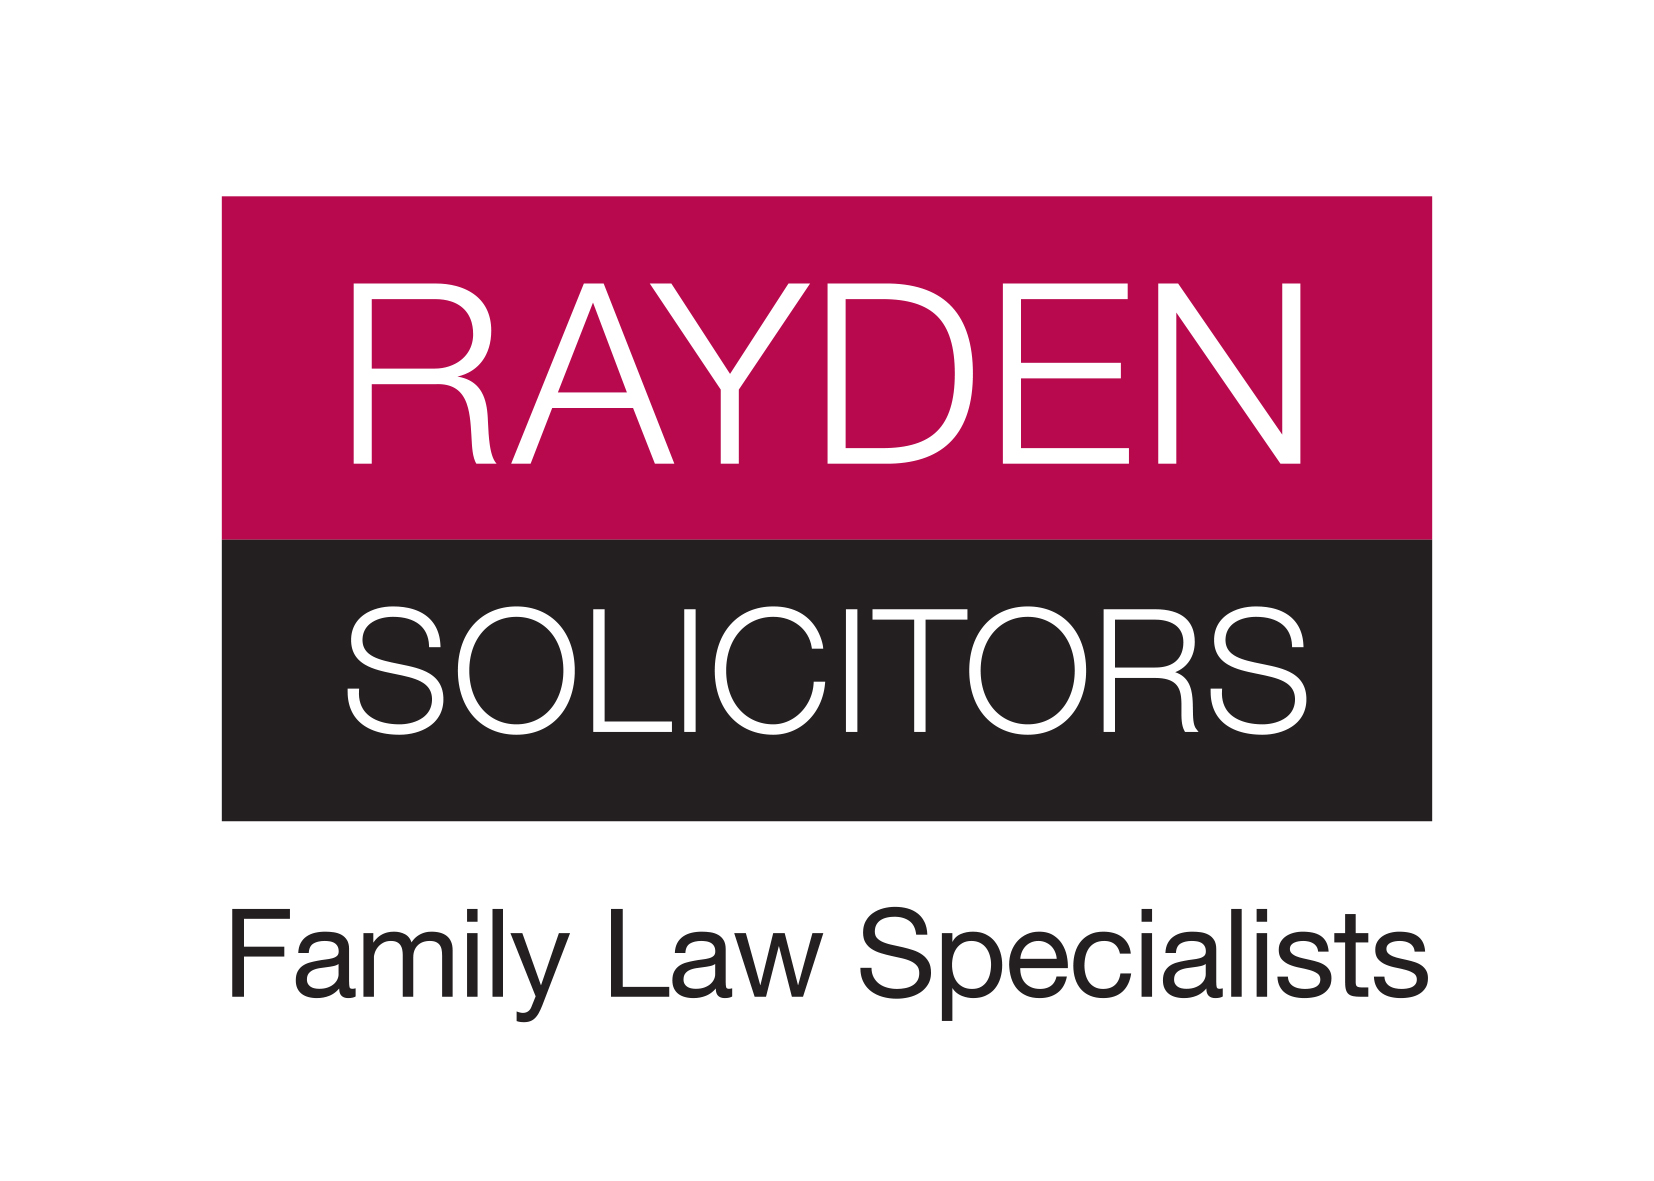 Rayden Solicitors